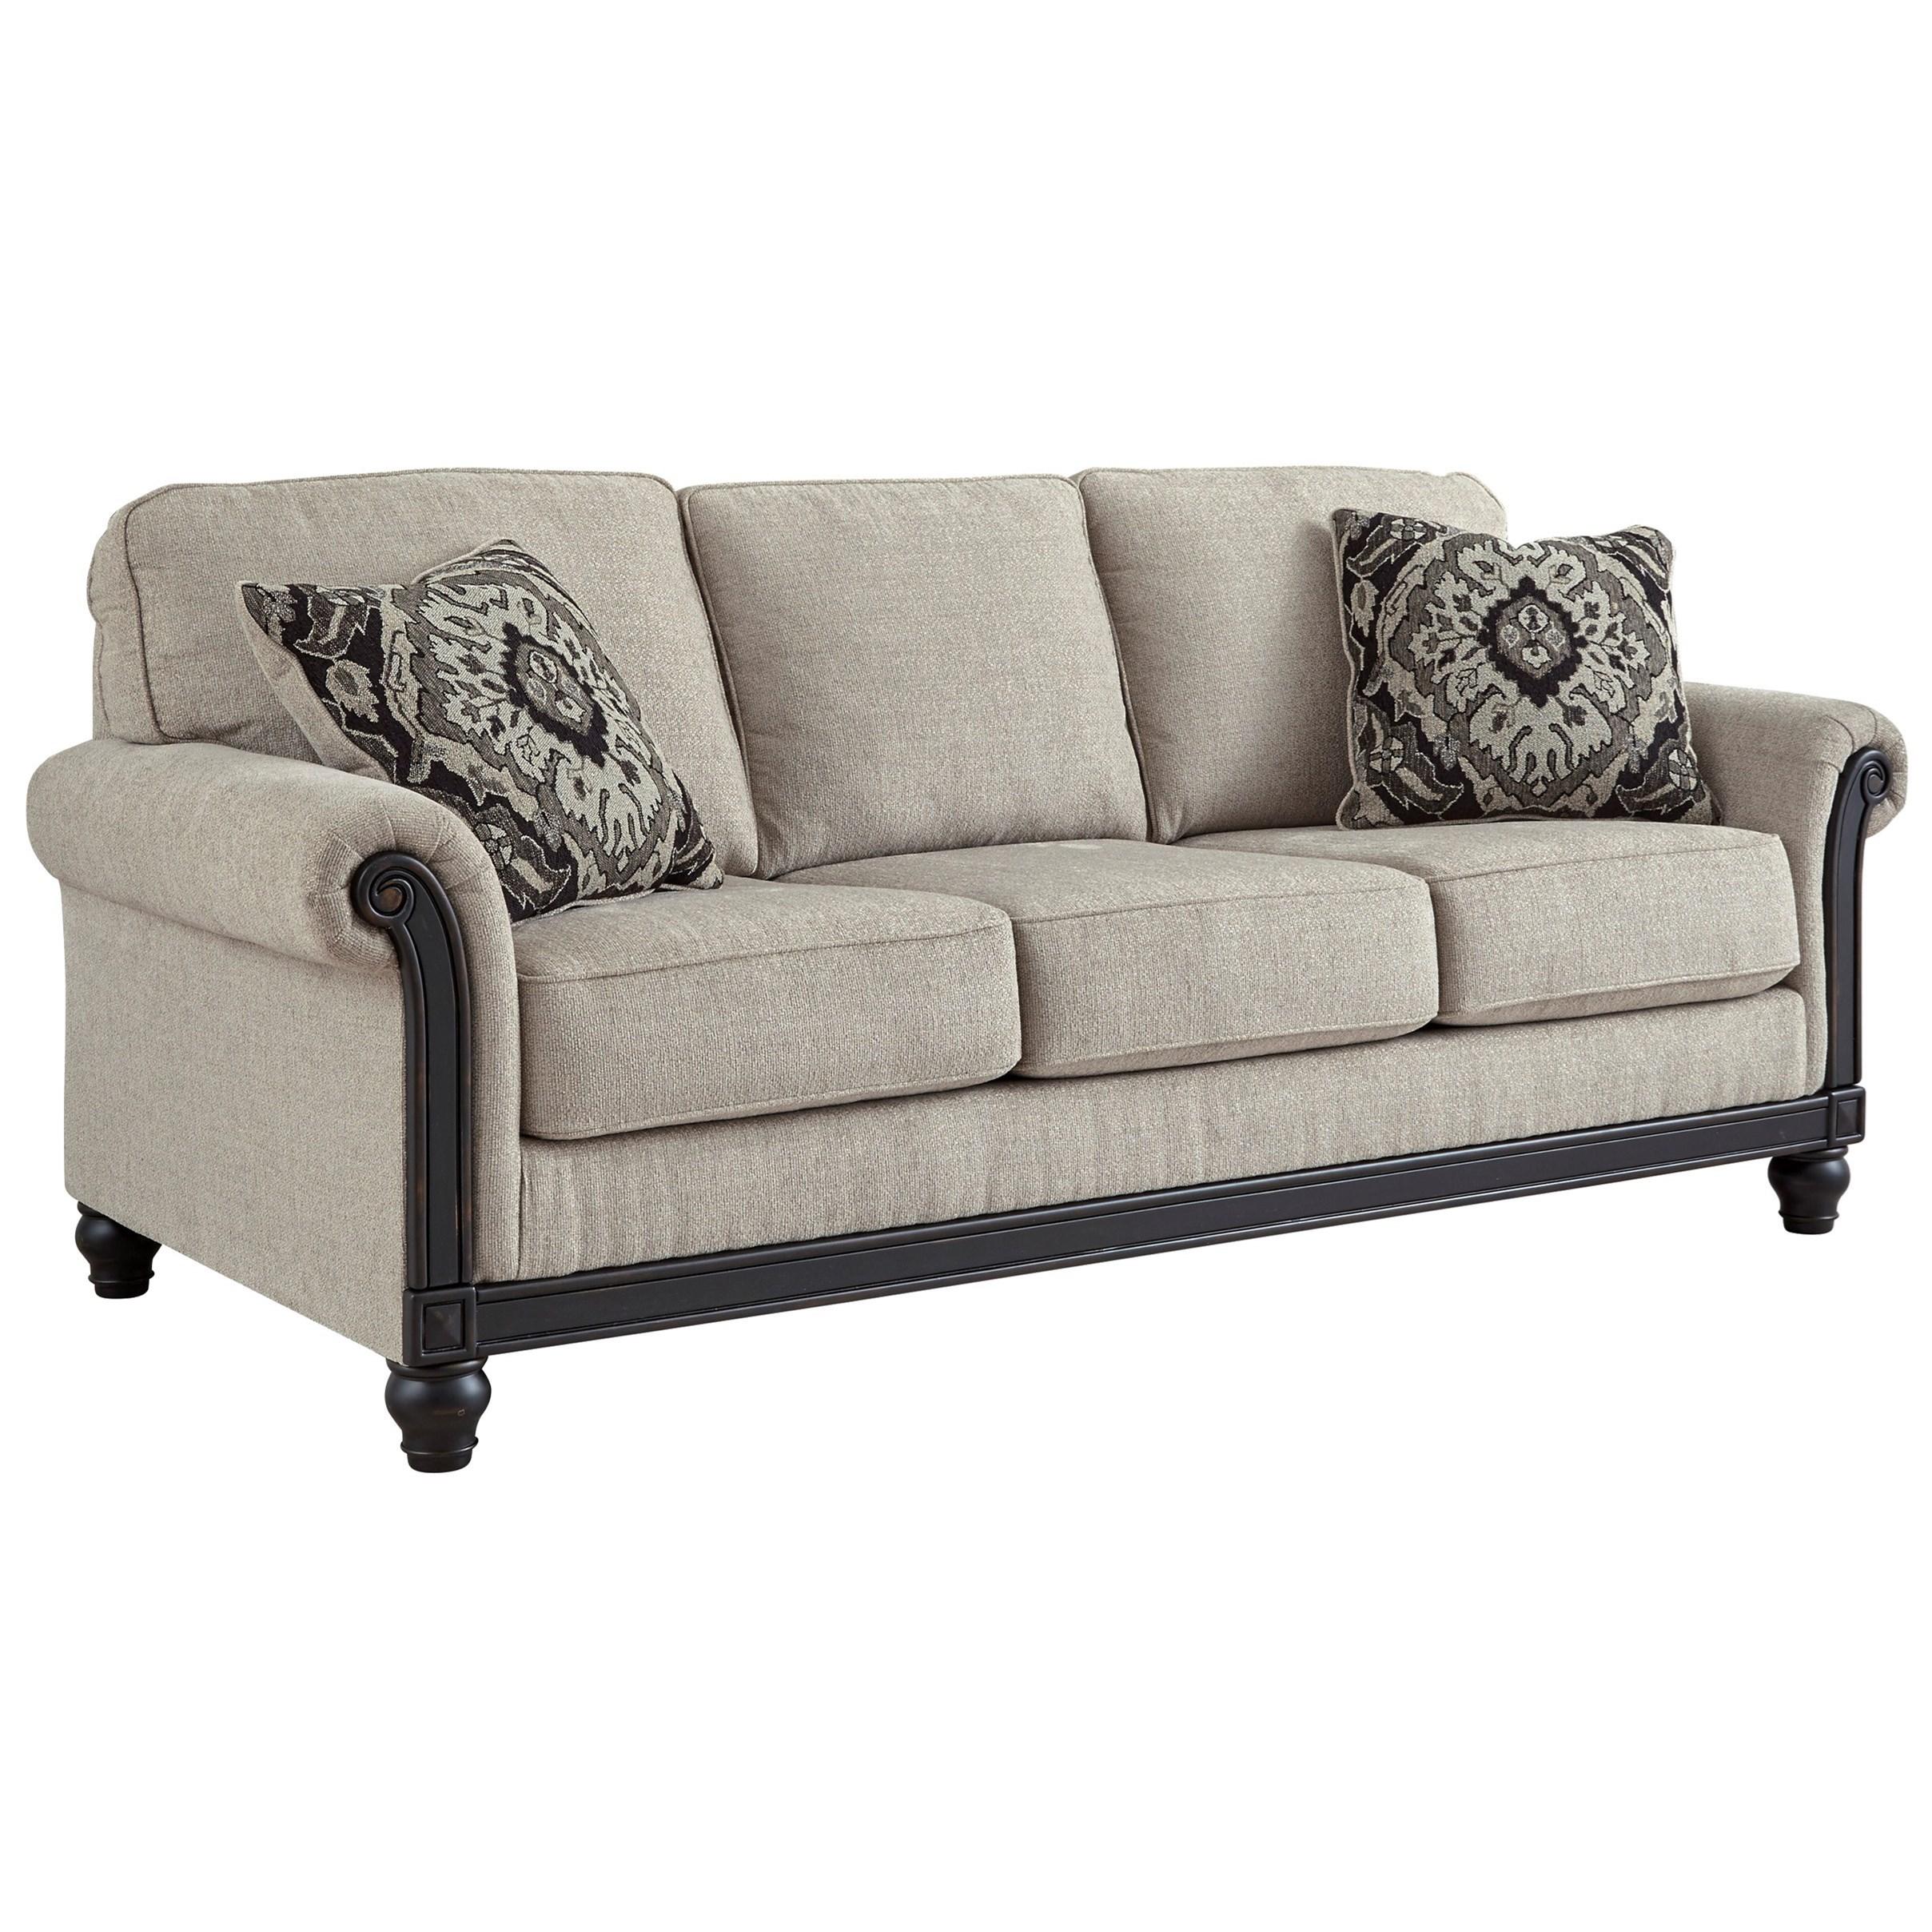 Traditional Sofa with Turned Bun Feet